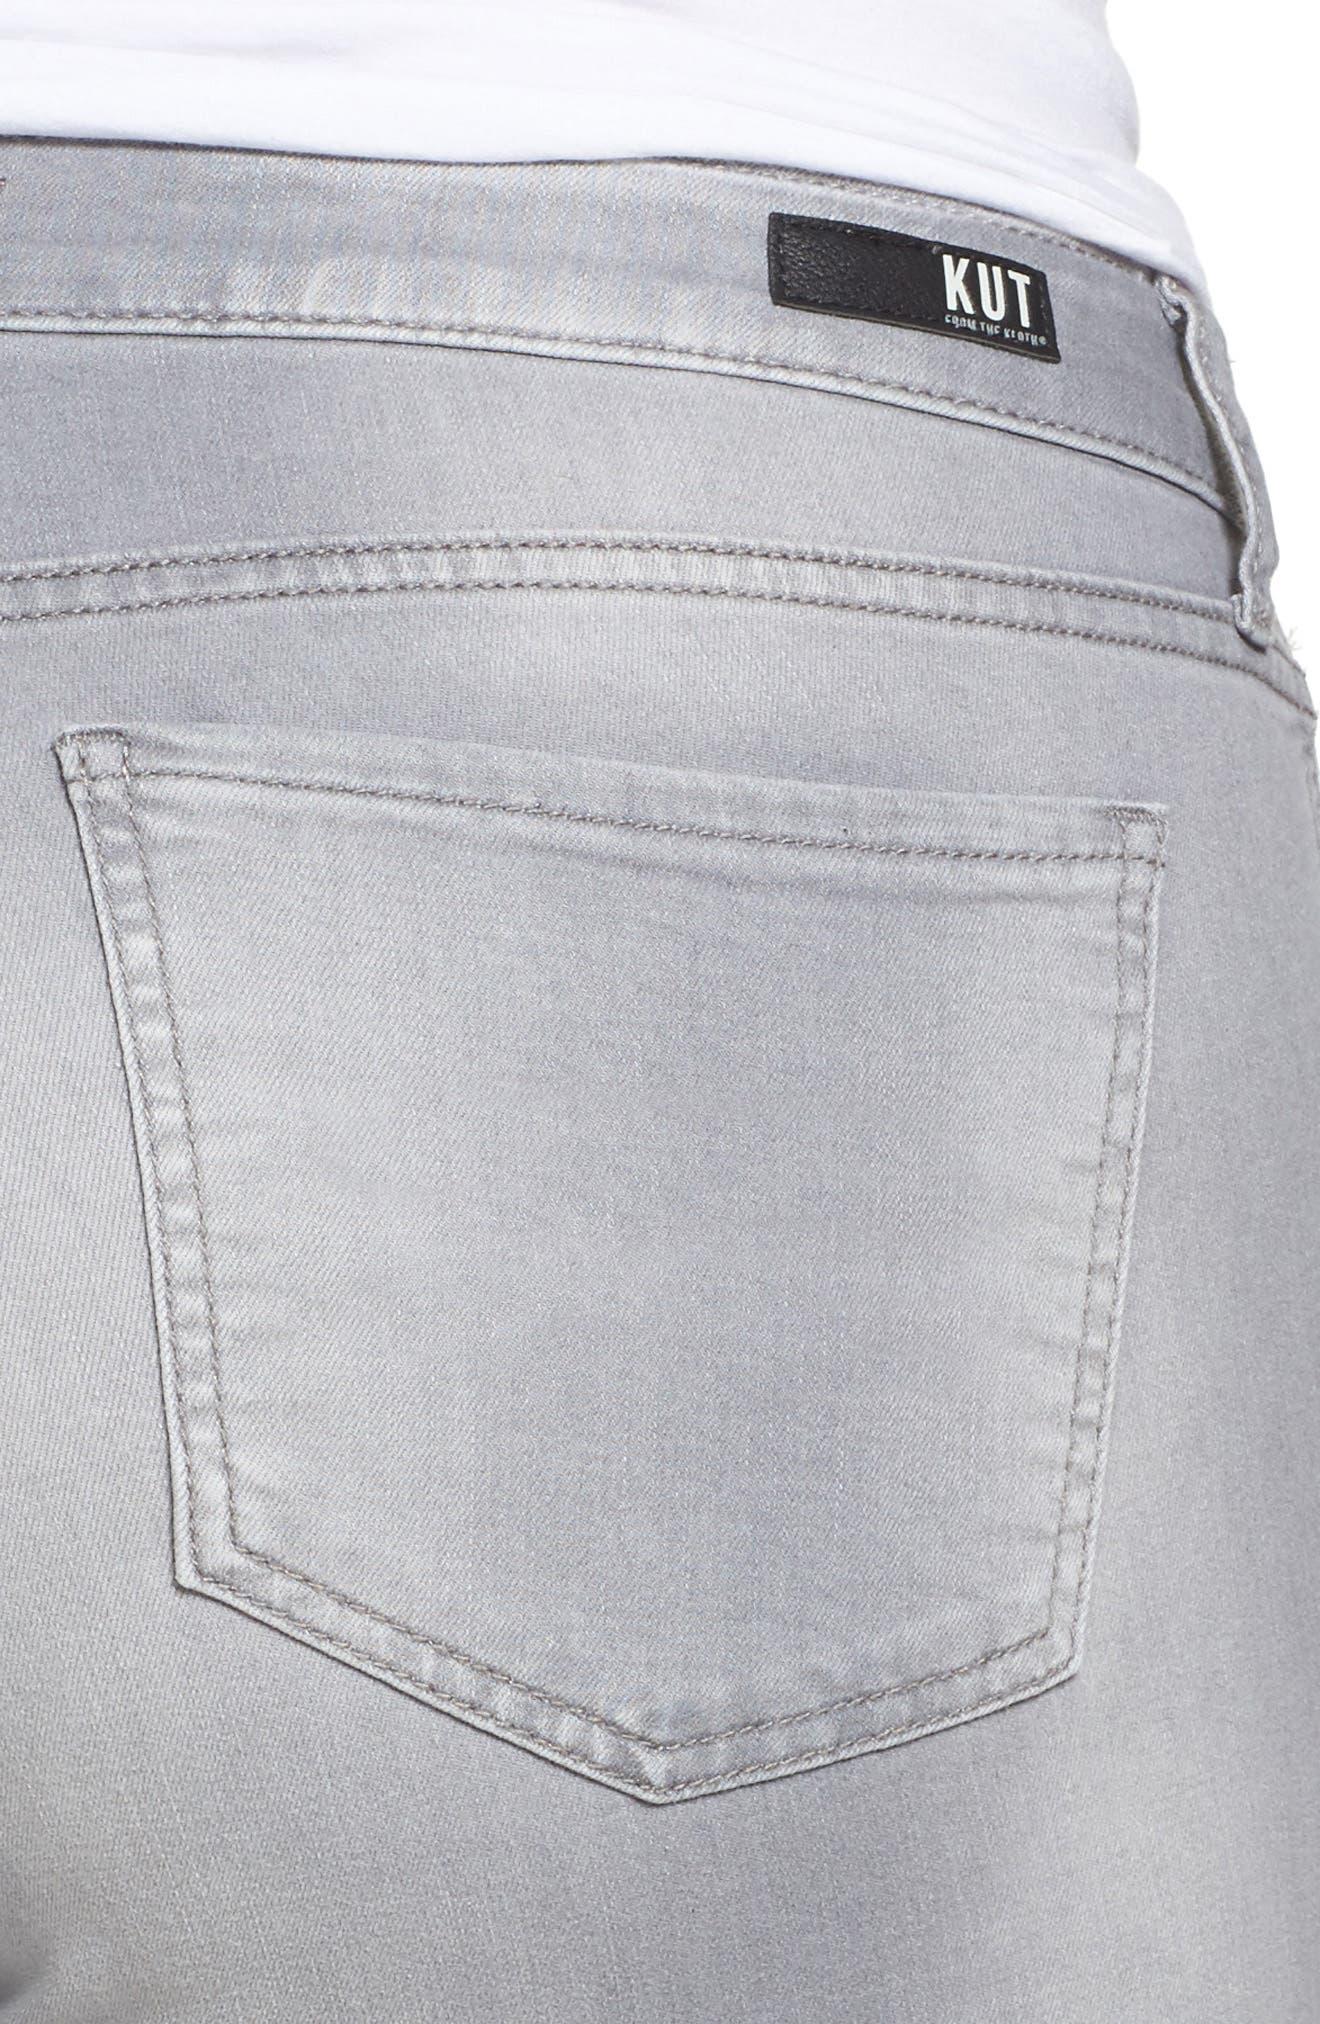 Mia Skinny Jeans,                             Alternate thumbnail 4, color,                             PREVAILED